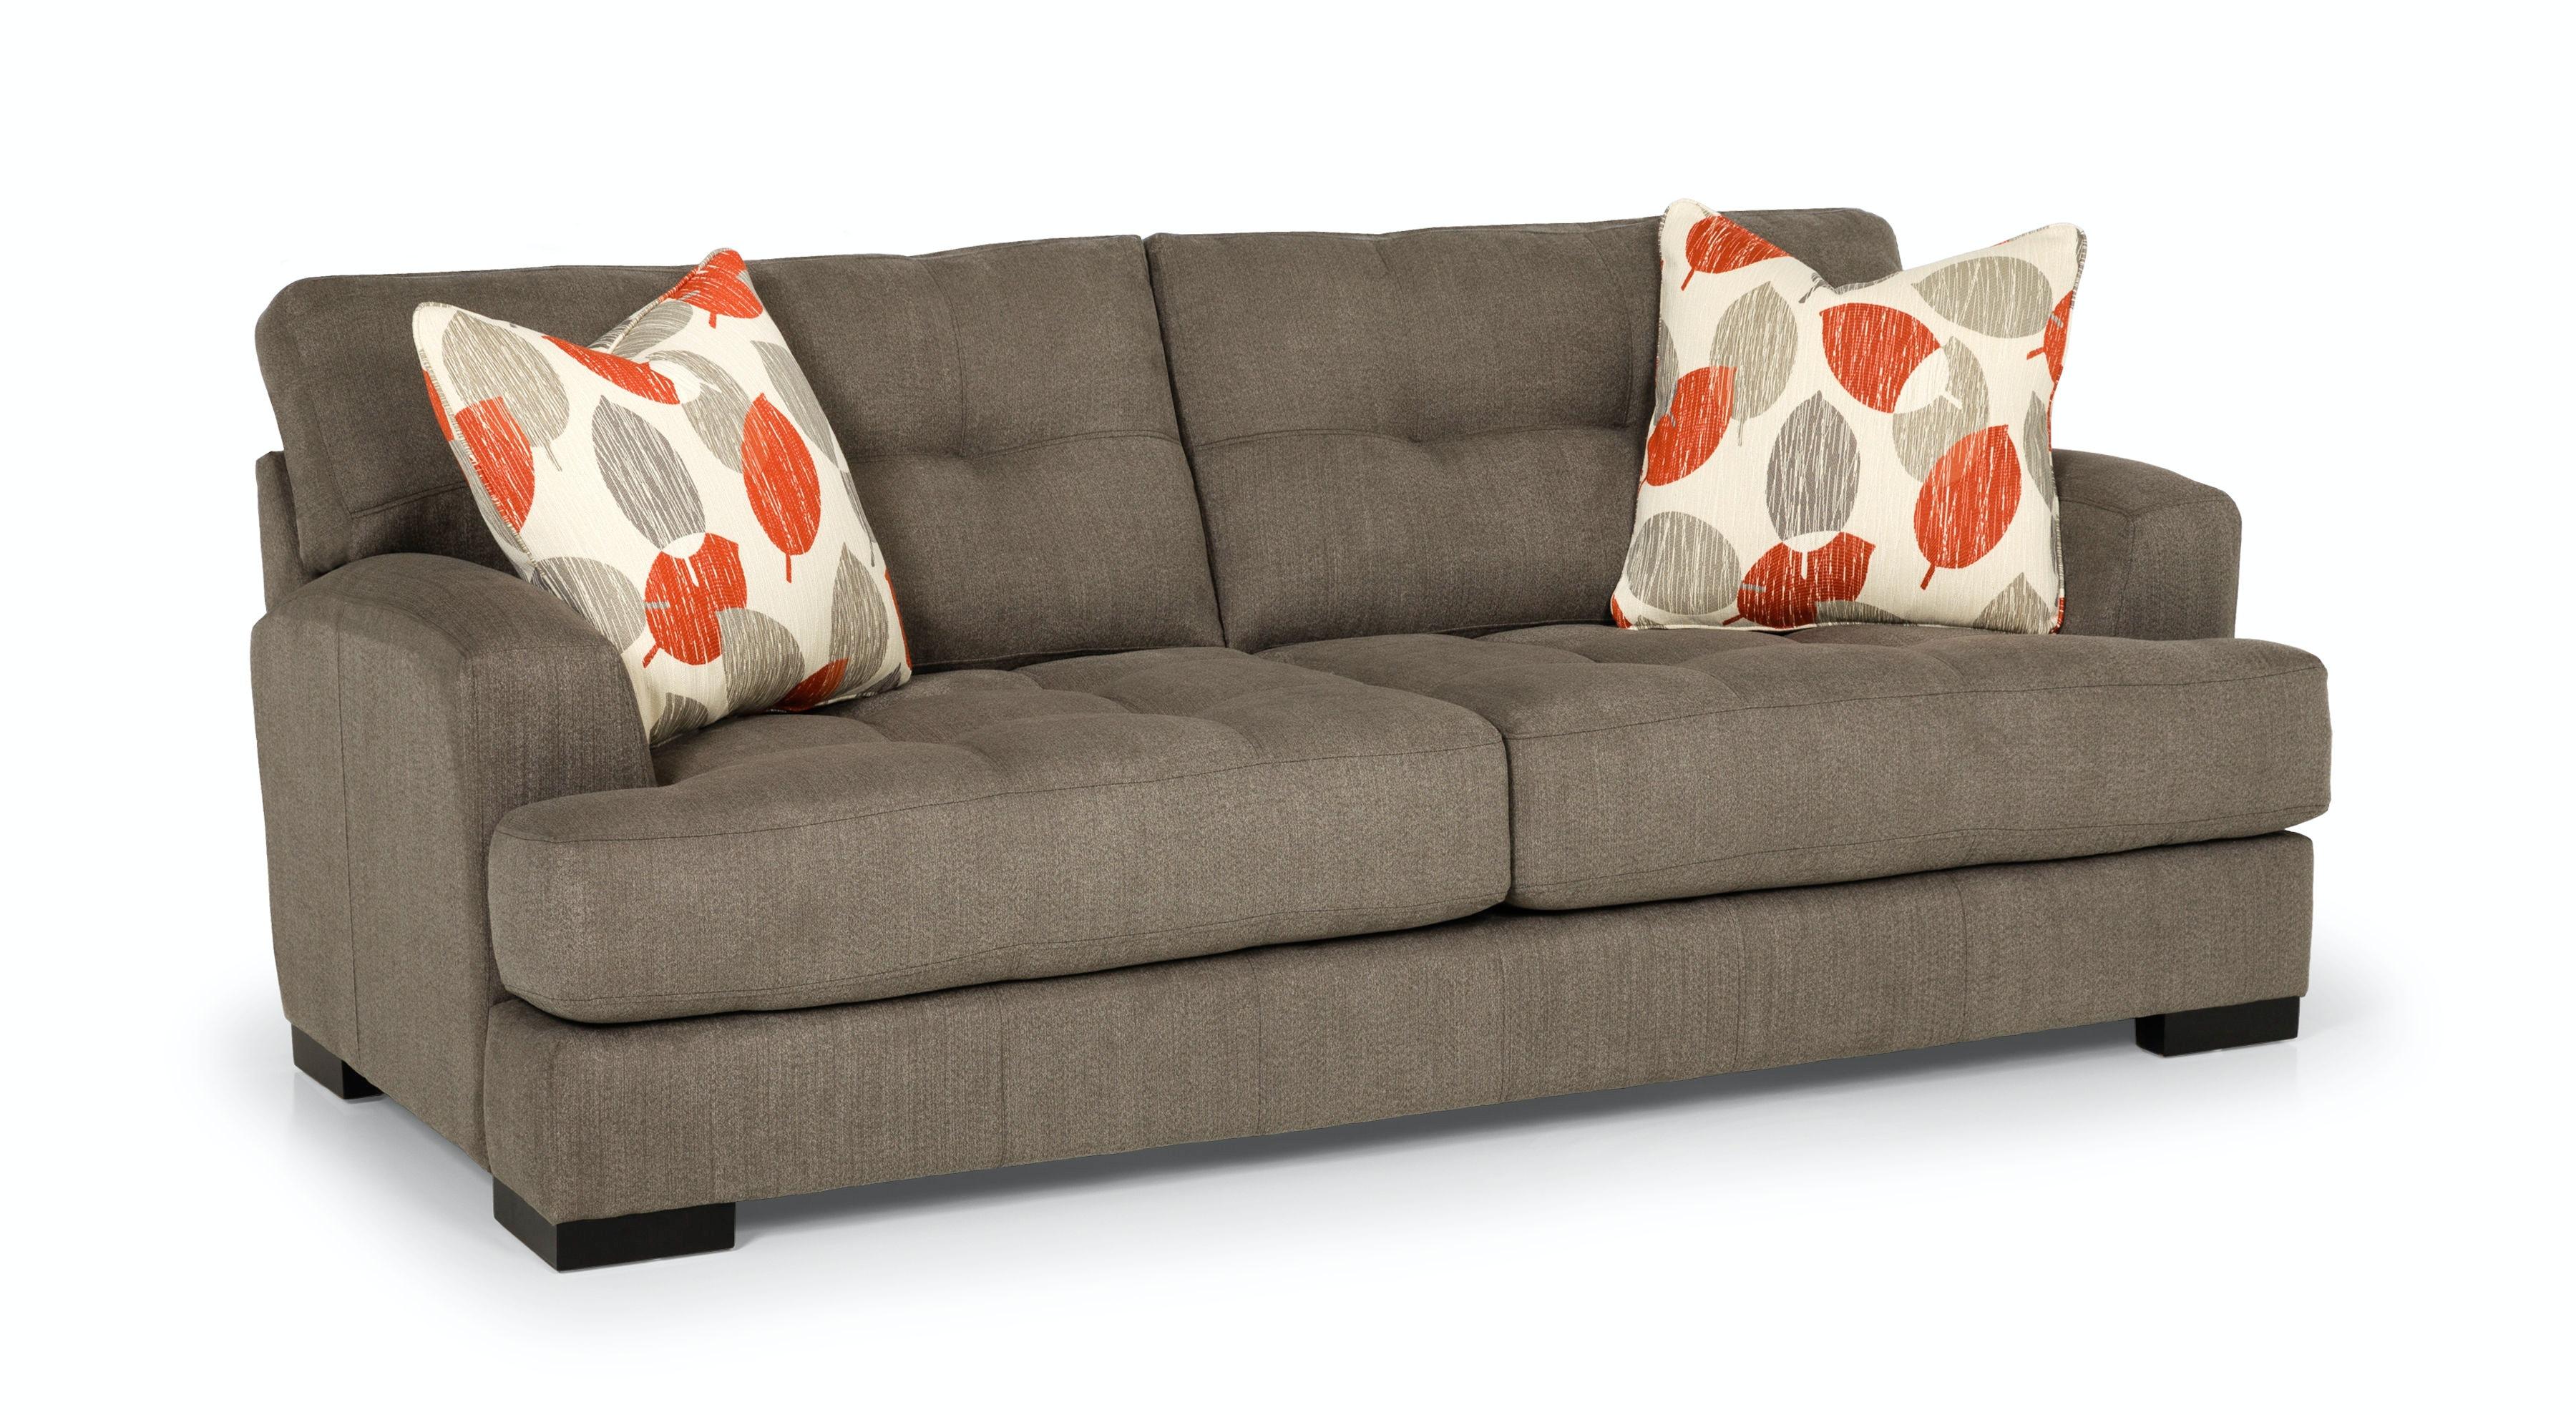 Stanton Furniture Sofa 30801 In Portland, Oregon